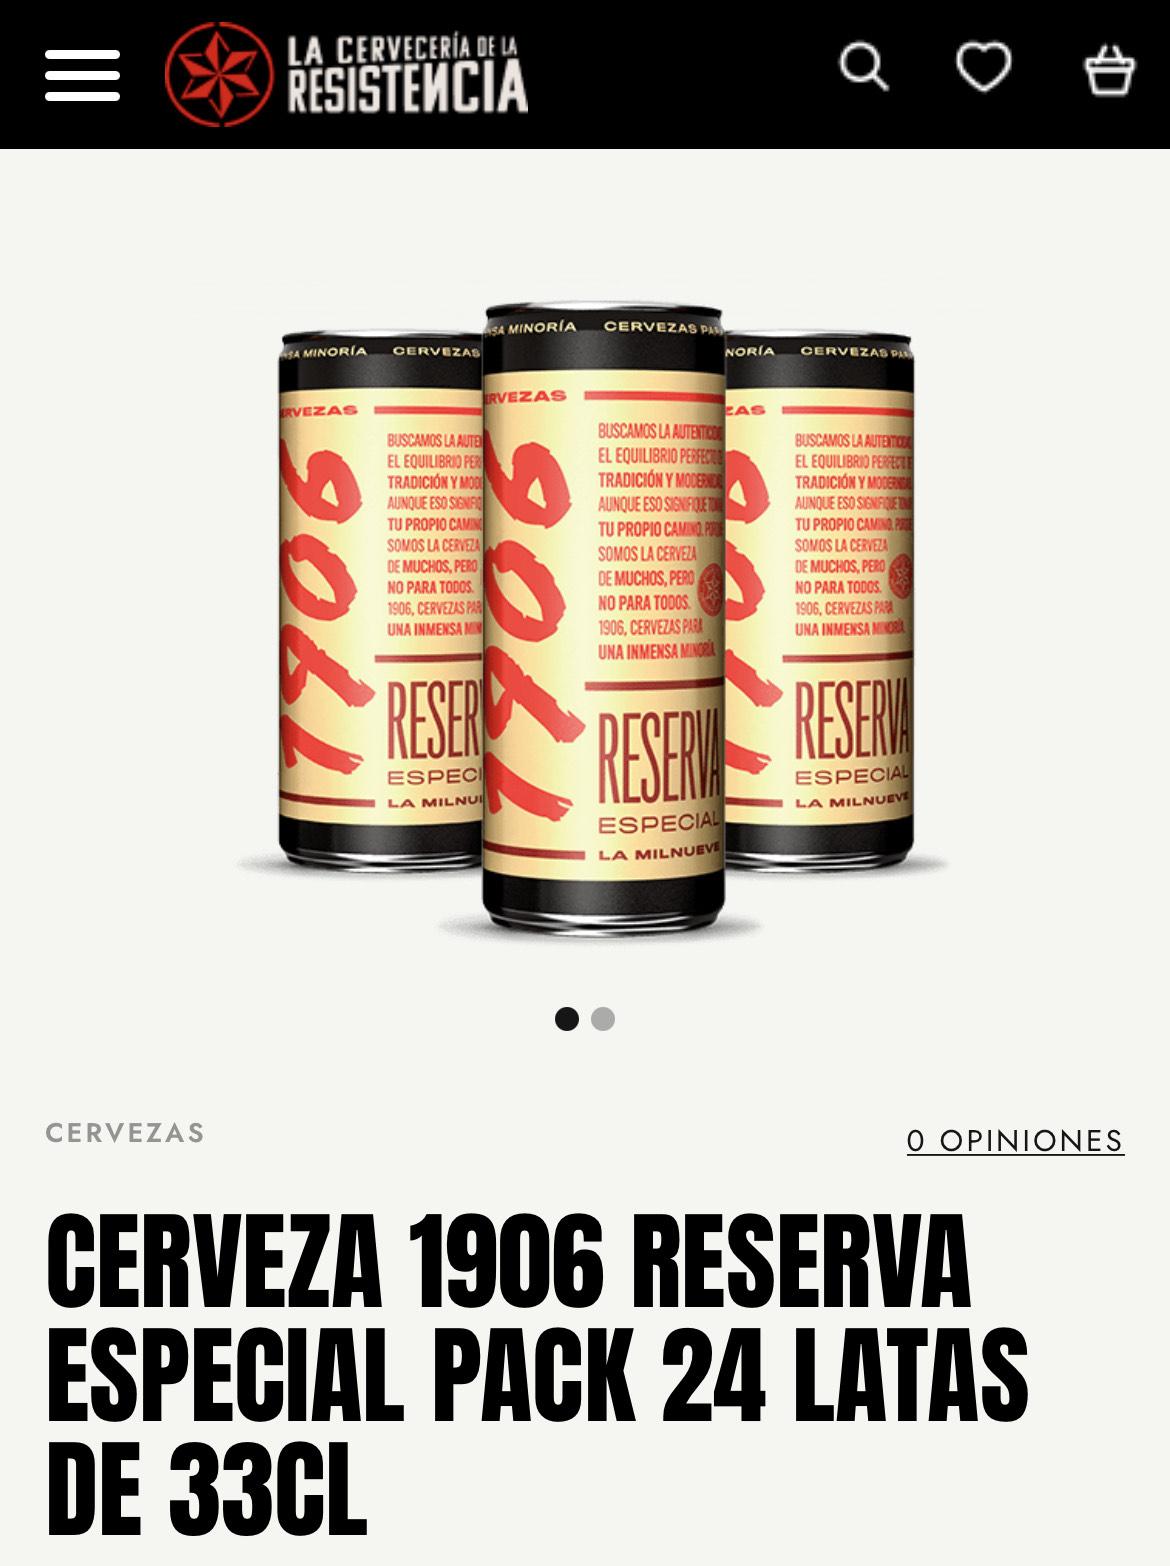 Cerveza 1906 20% descuento